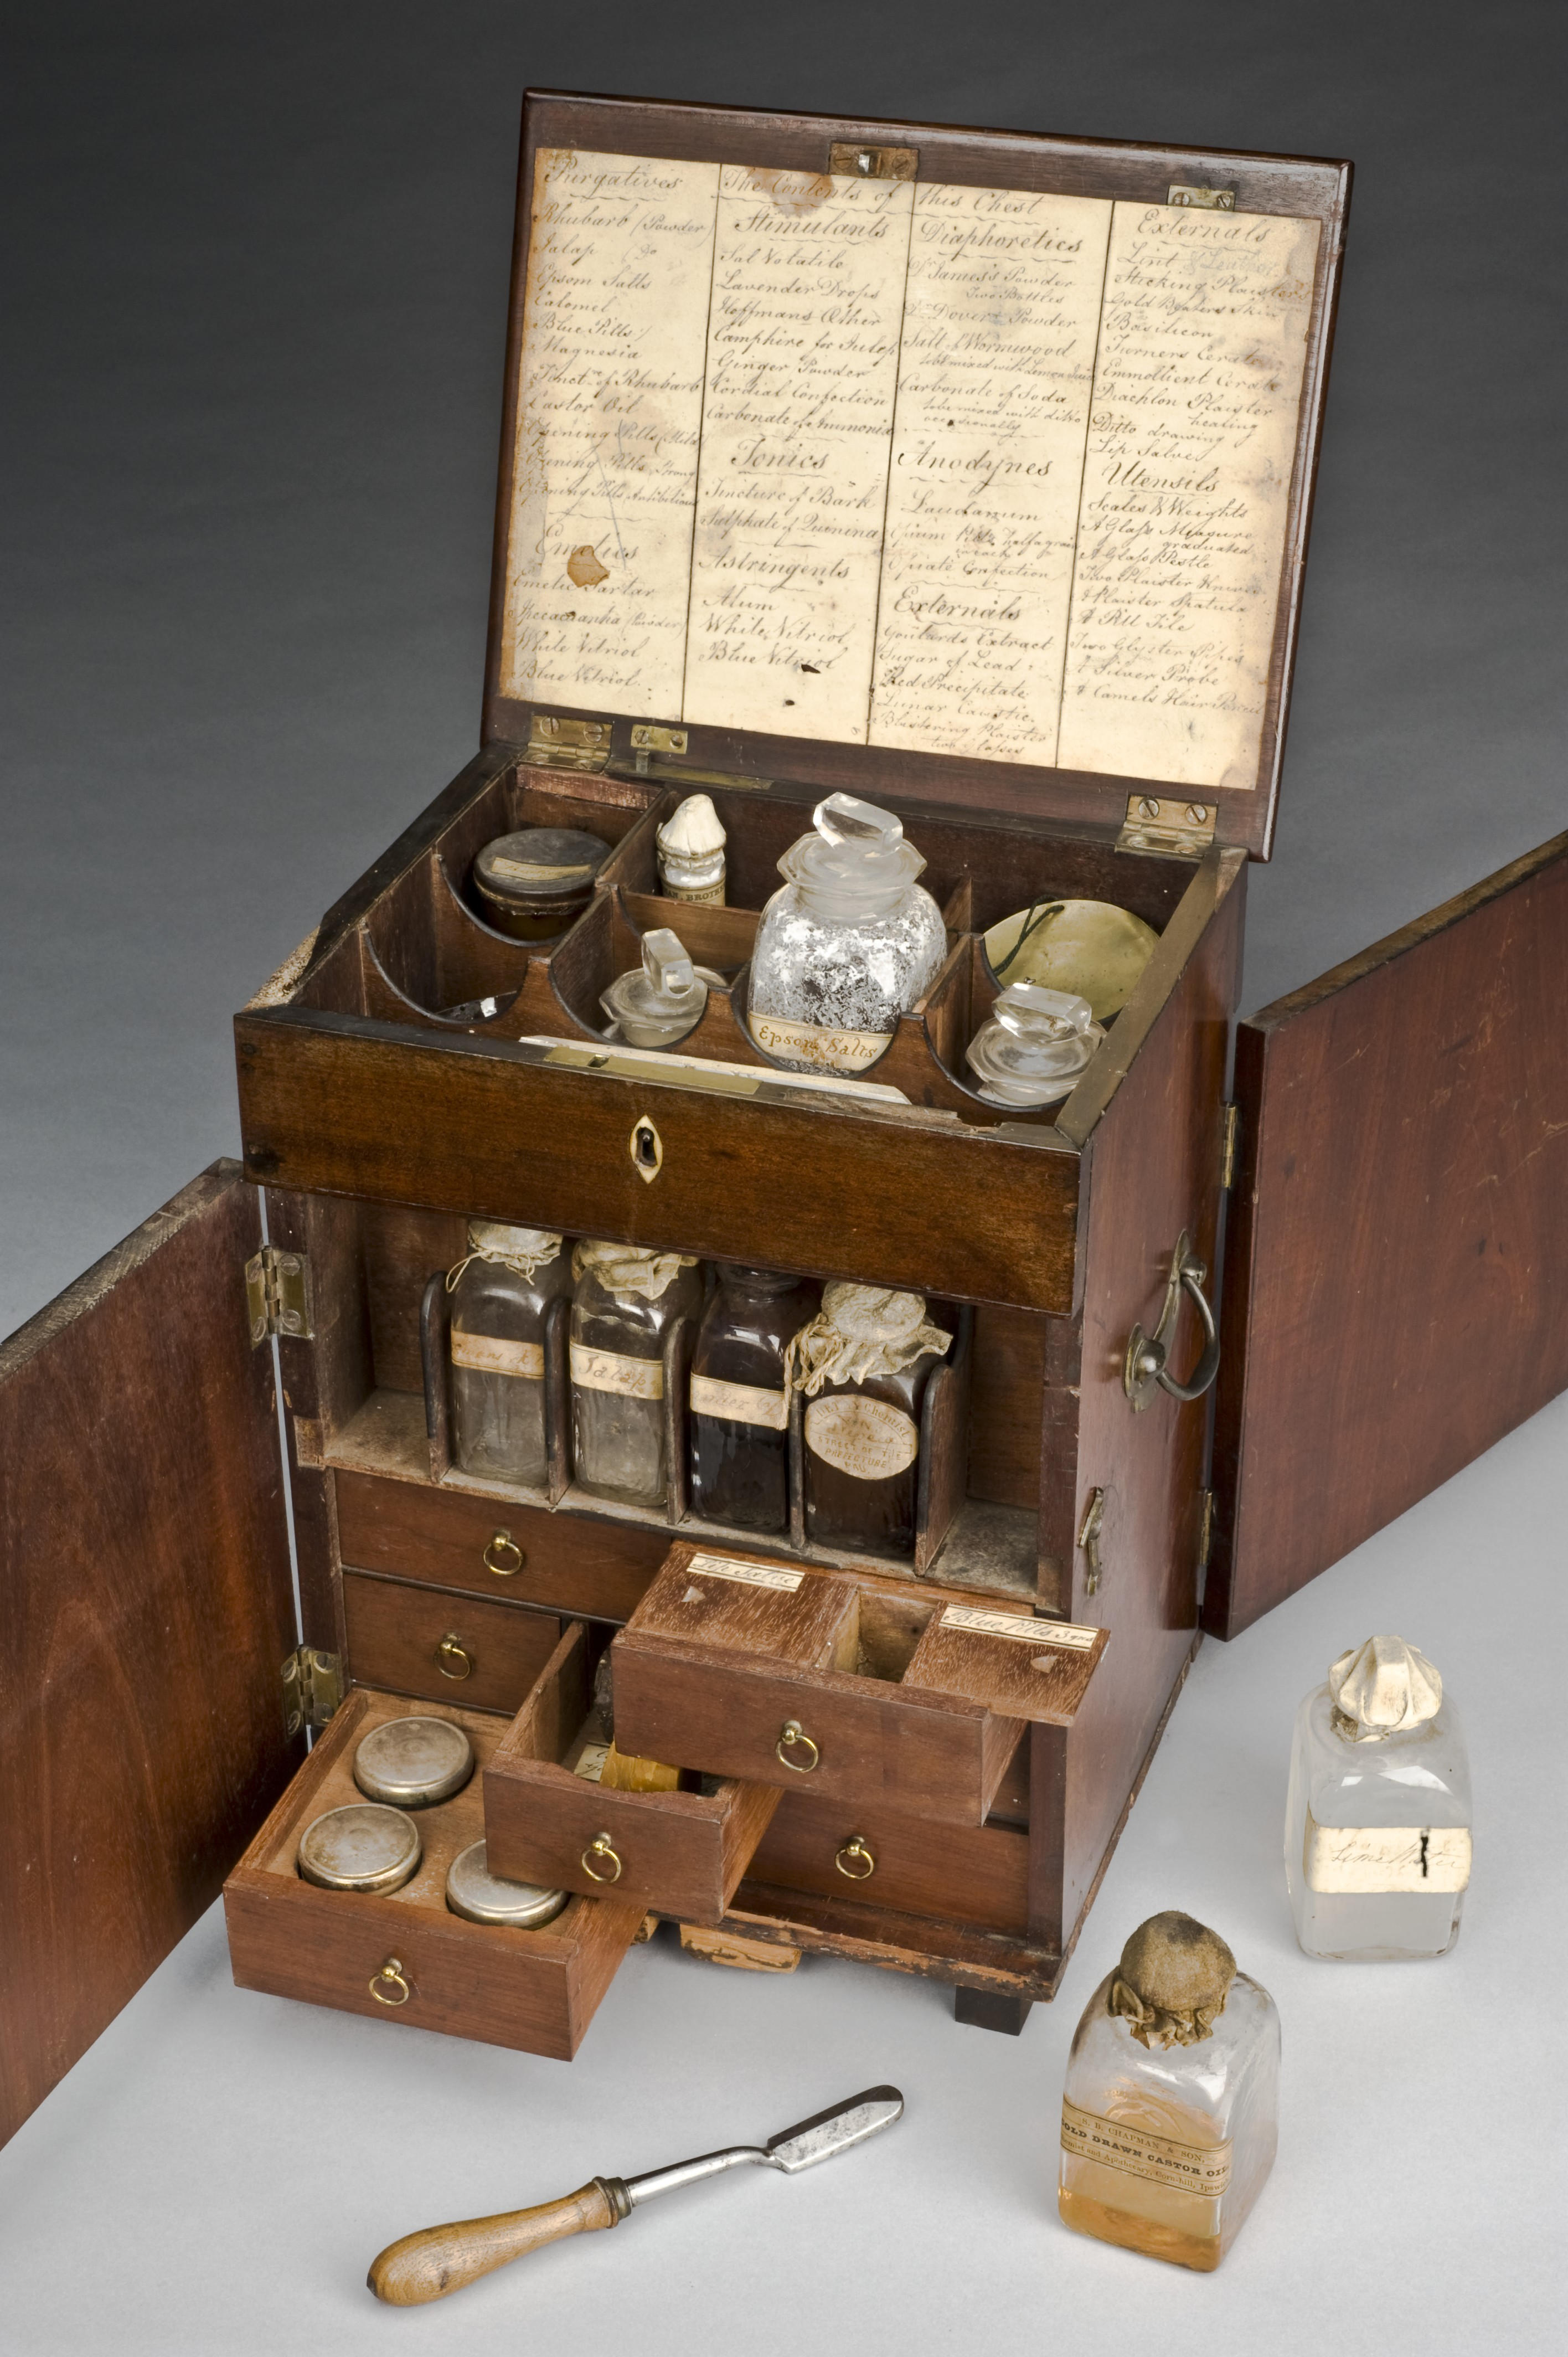 Mahogany_medicine_chest,_England,_1801-1900_Wellcome_L0057102